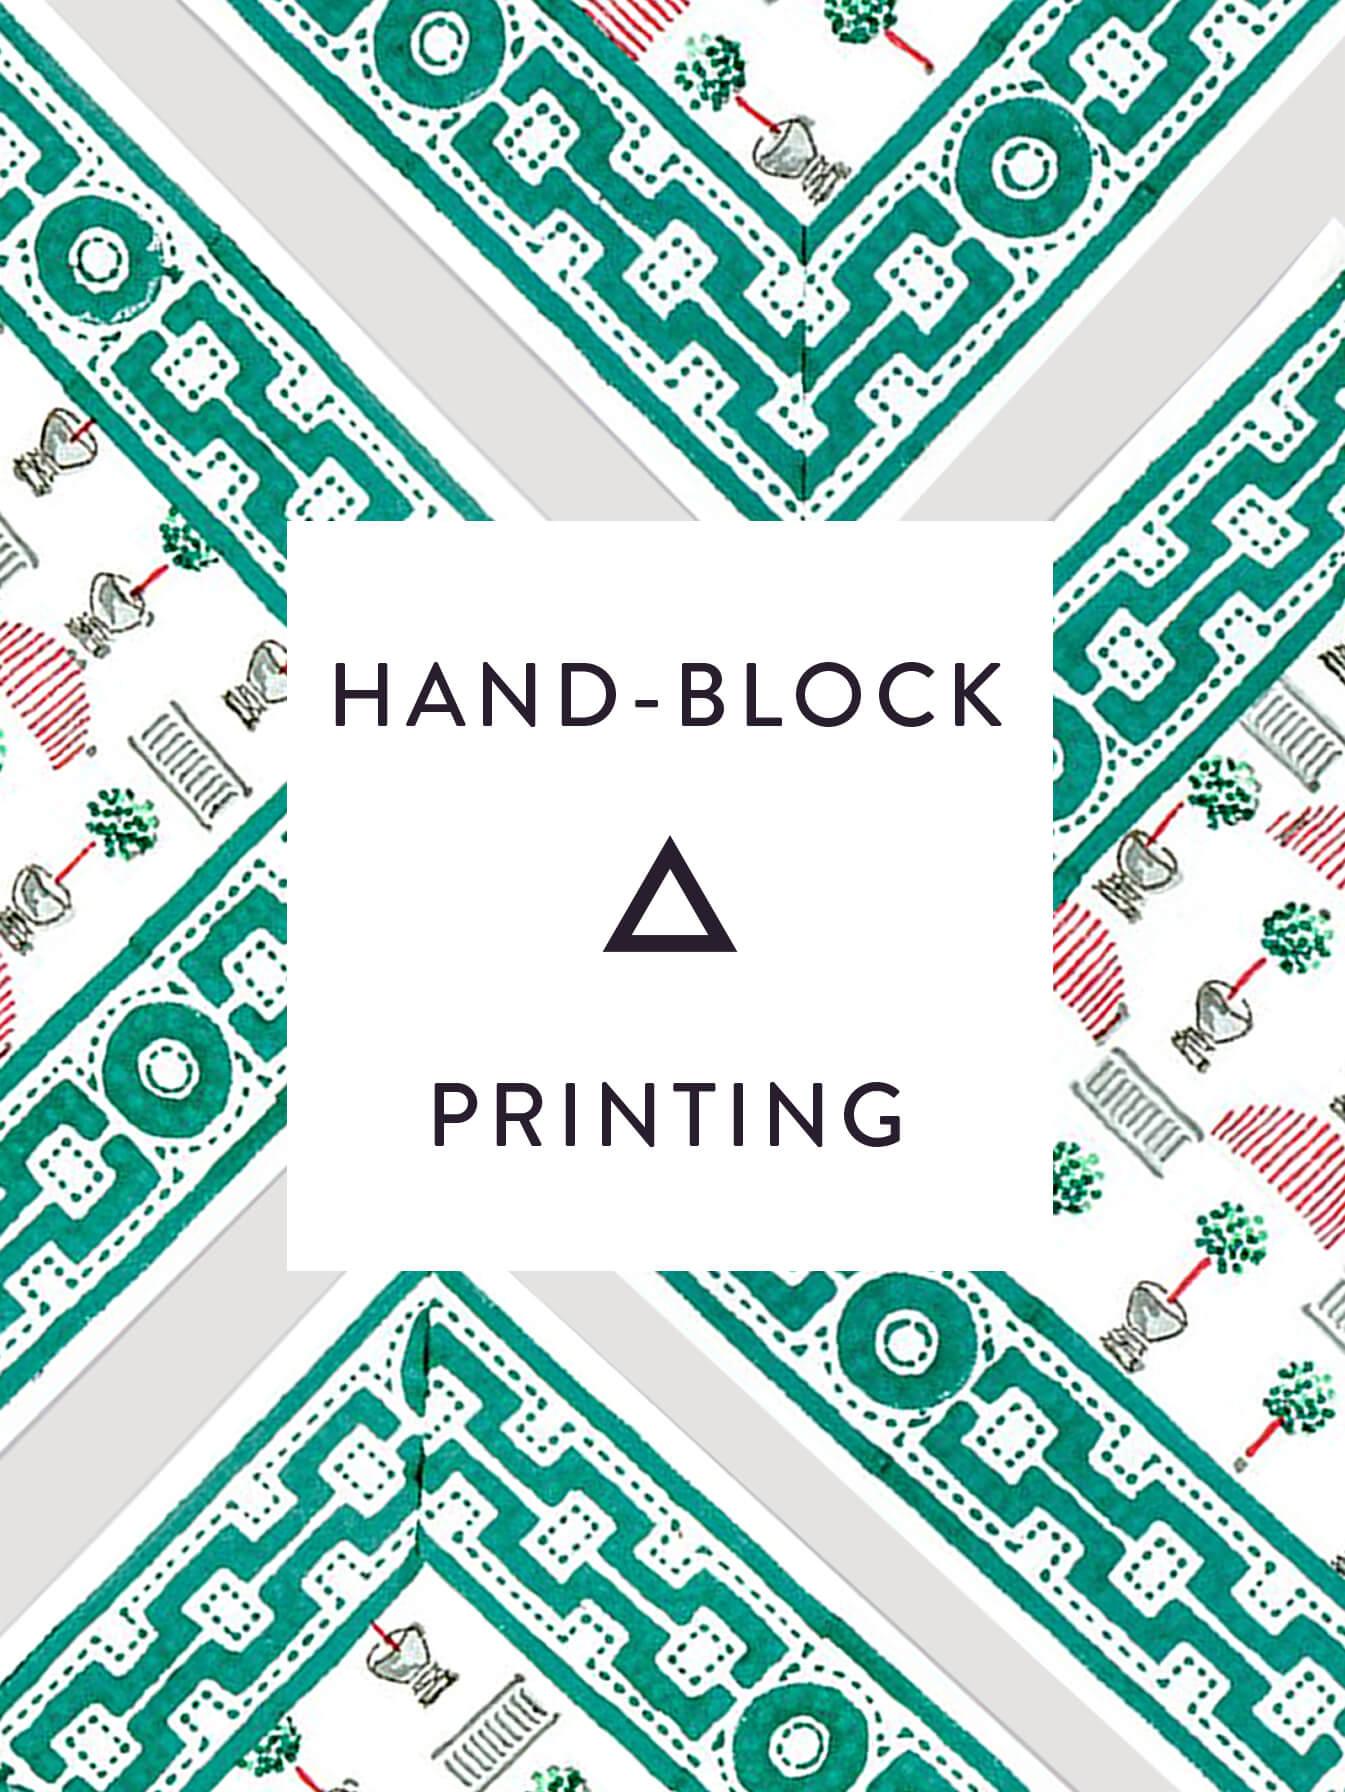 Hand Block Printing.